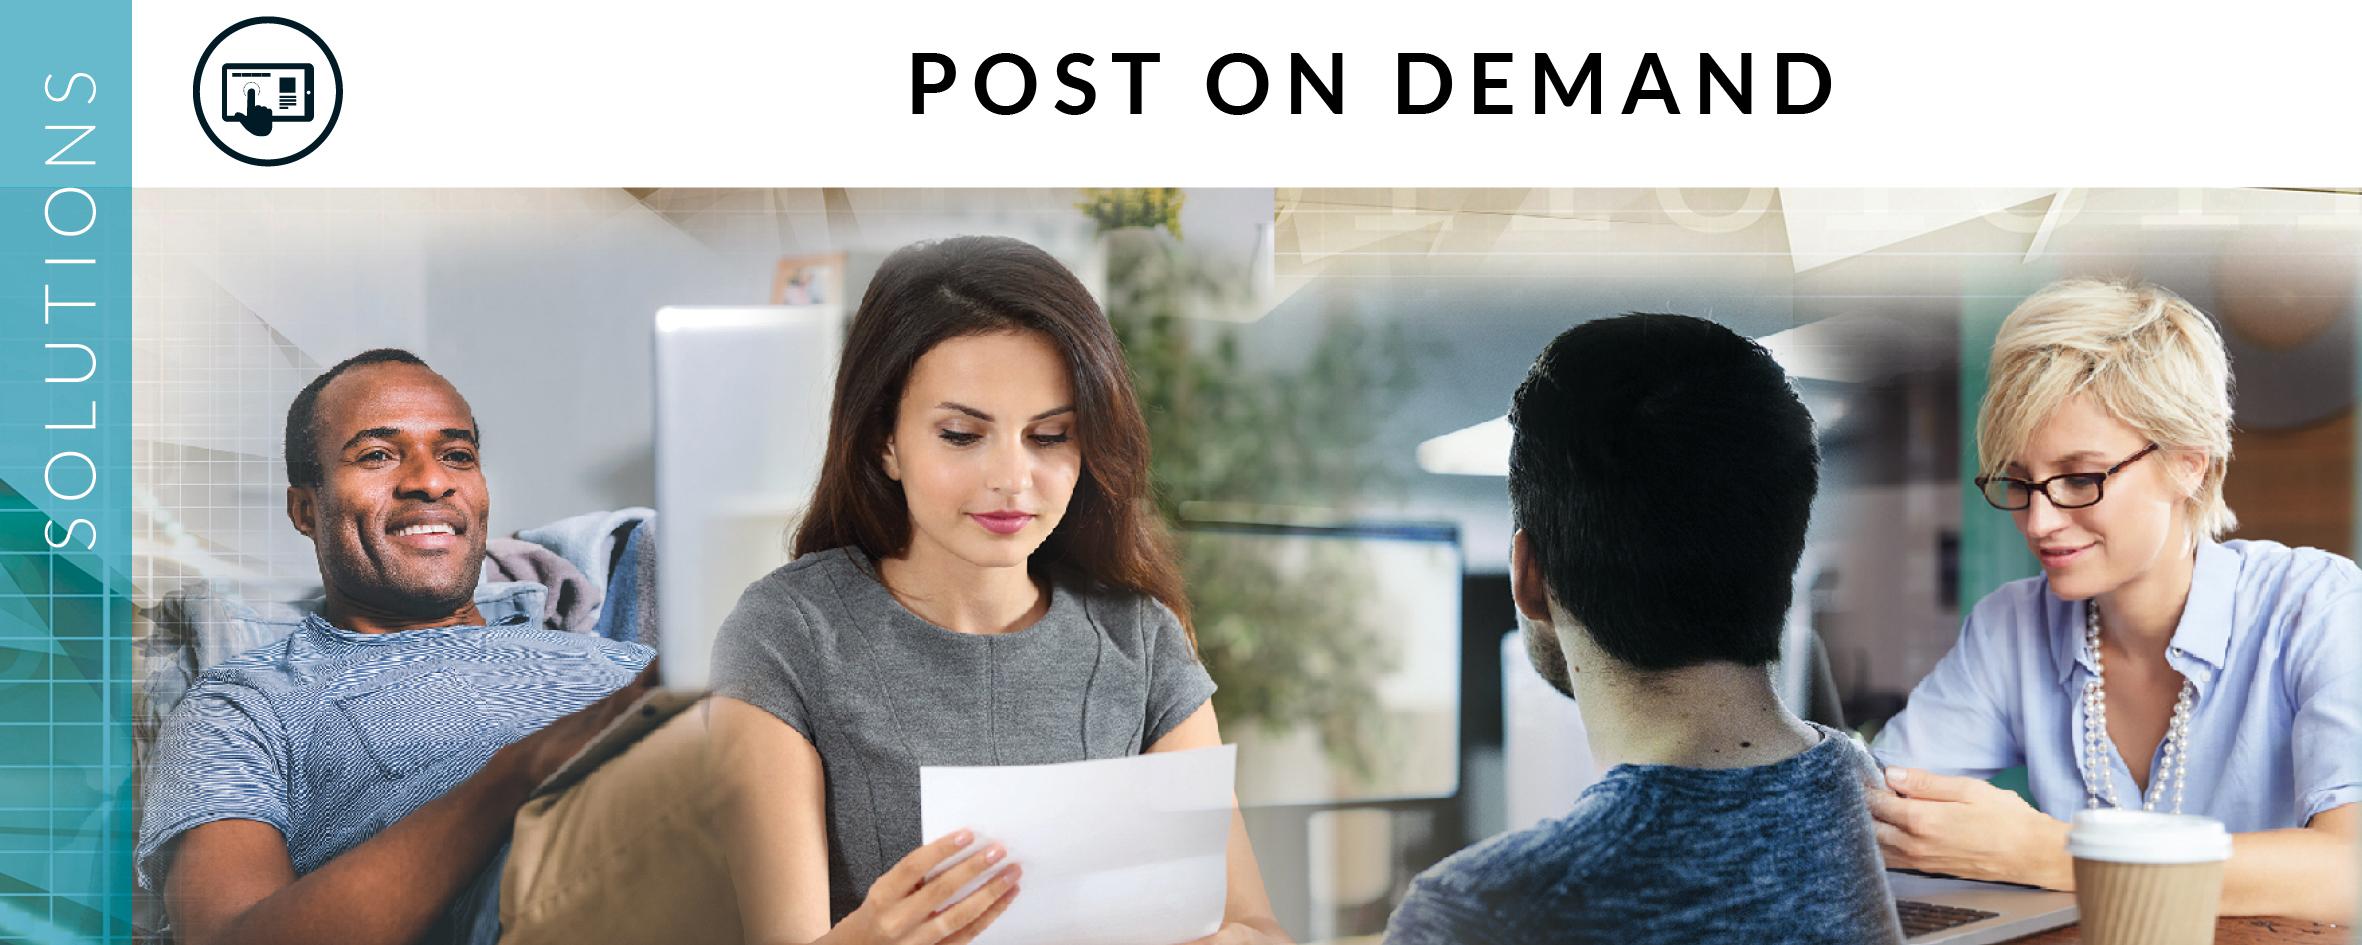 Post on Demand